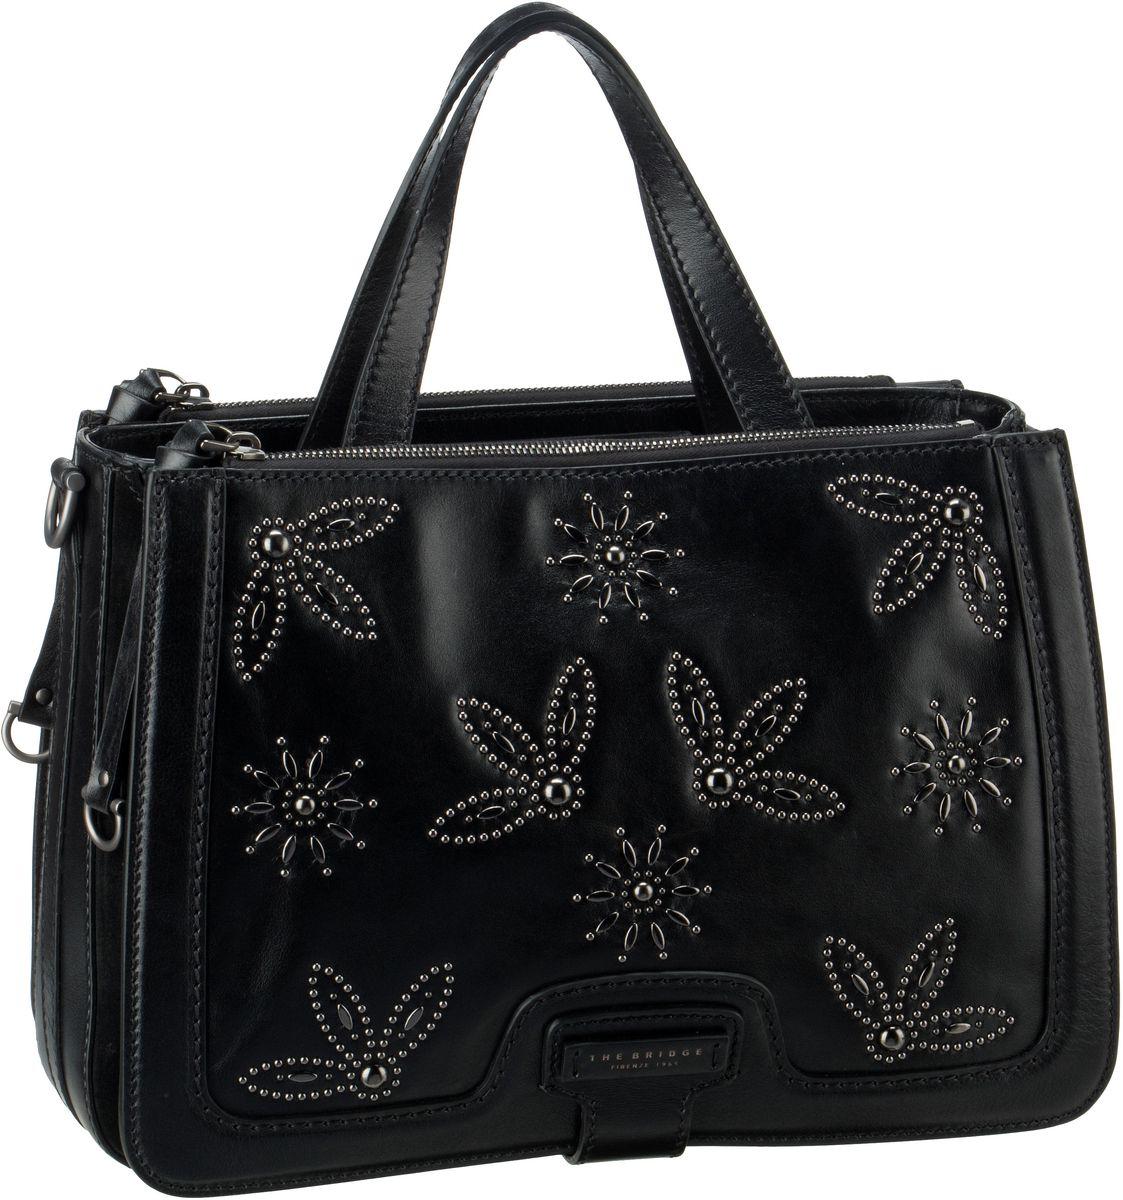 Handtasche Giglio Handtasche 3029 Studs Nero/Rutenio Scuro